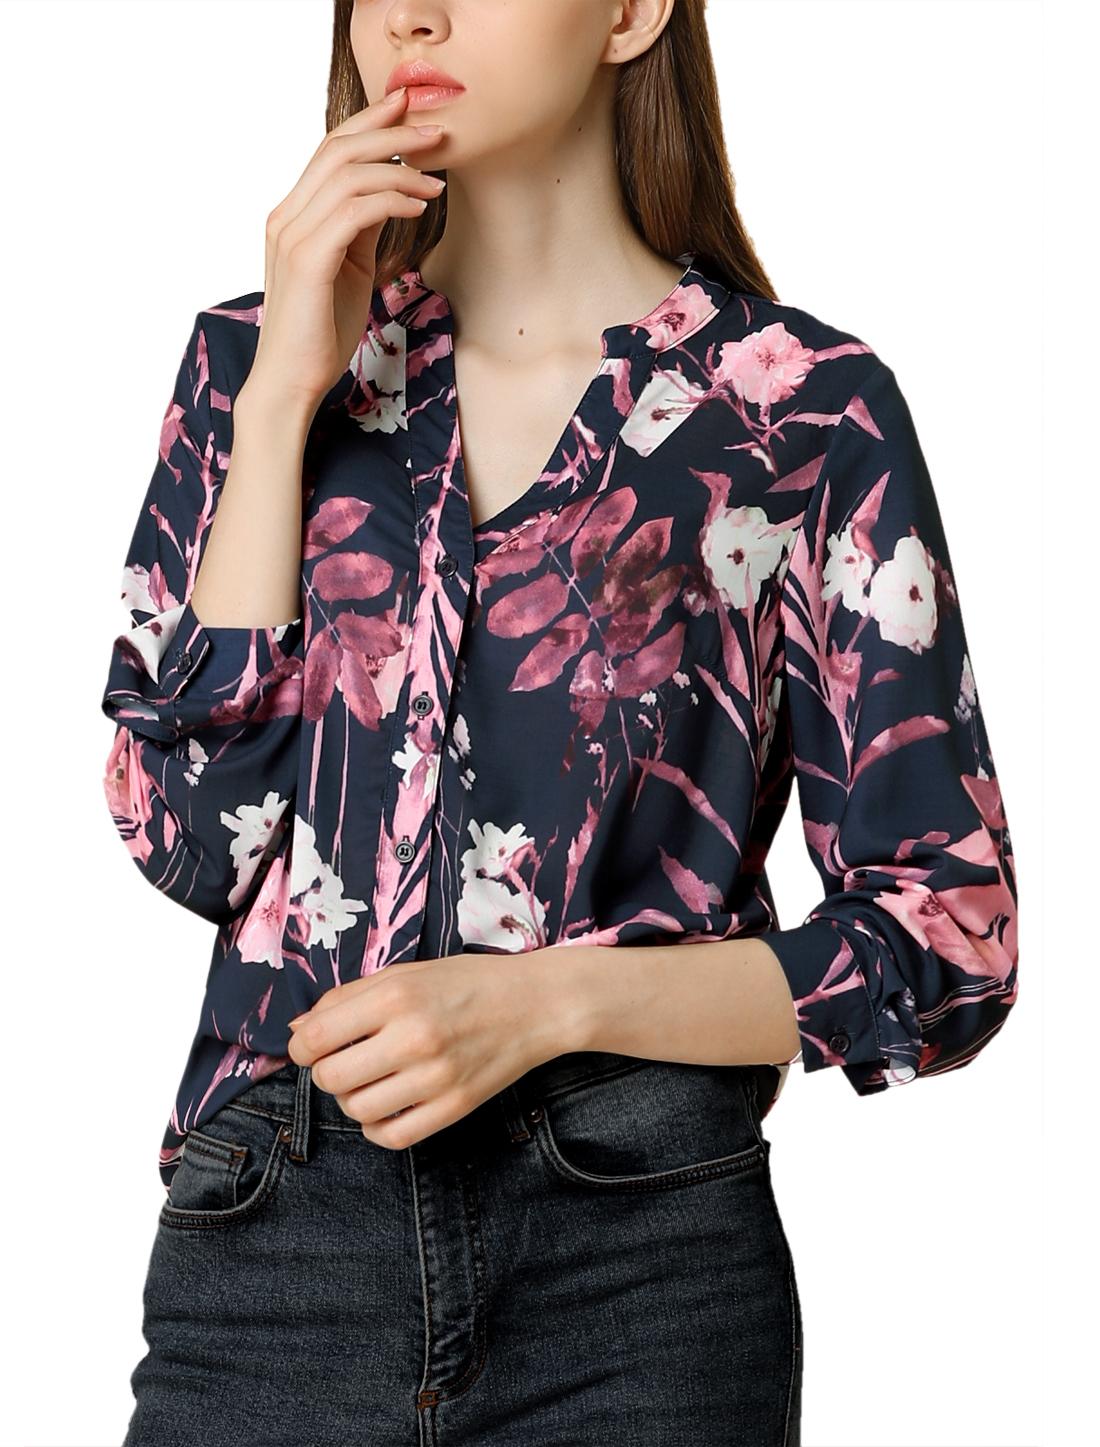 Allegra K Women's Button Down Stand Collar V Neck Floral Blouse Navy Blue XL